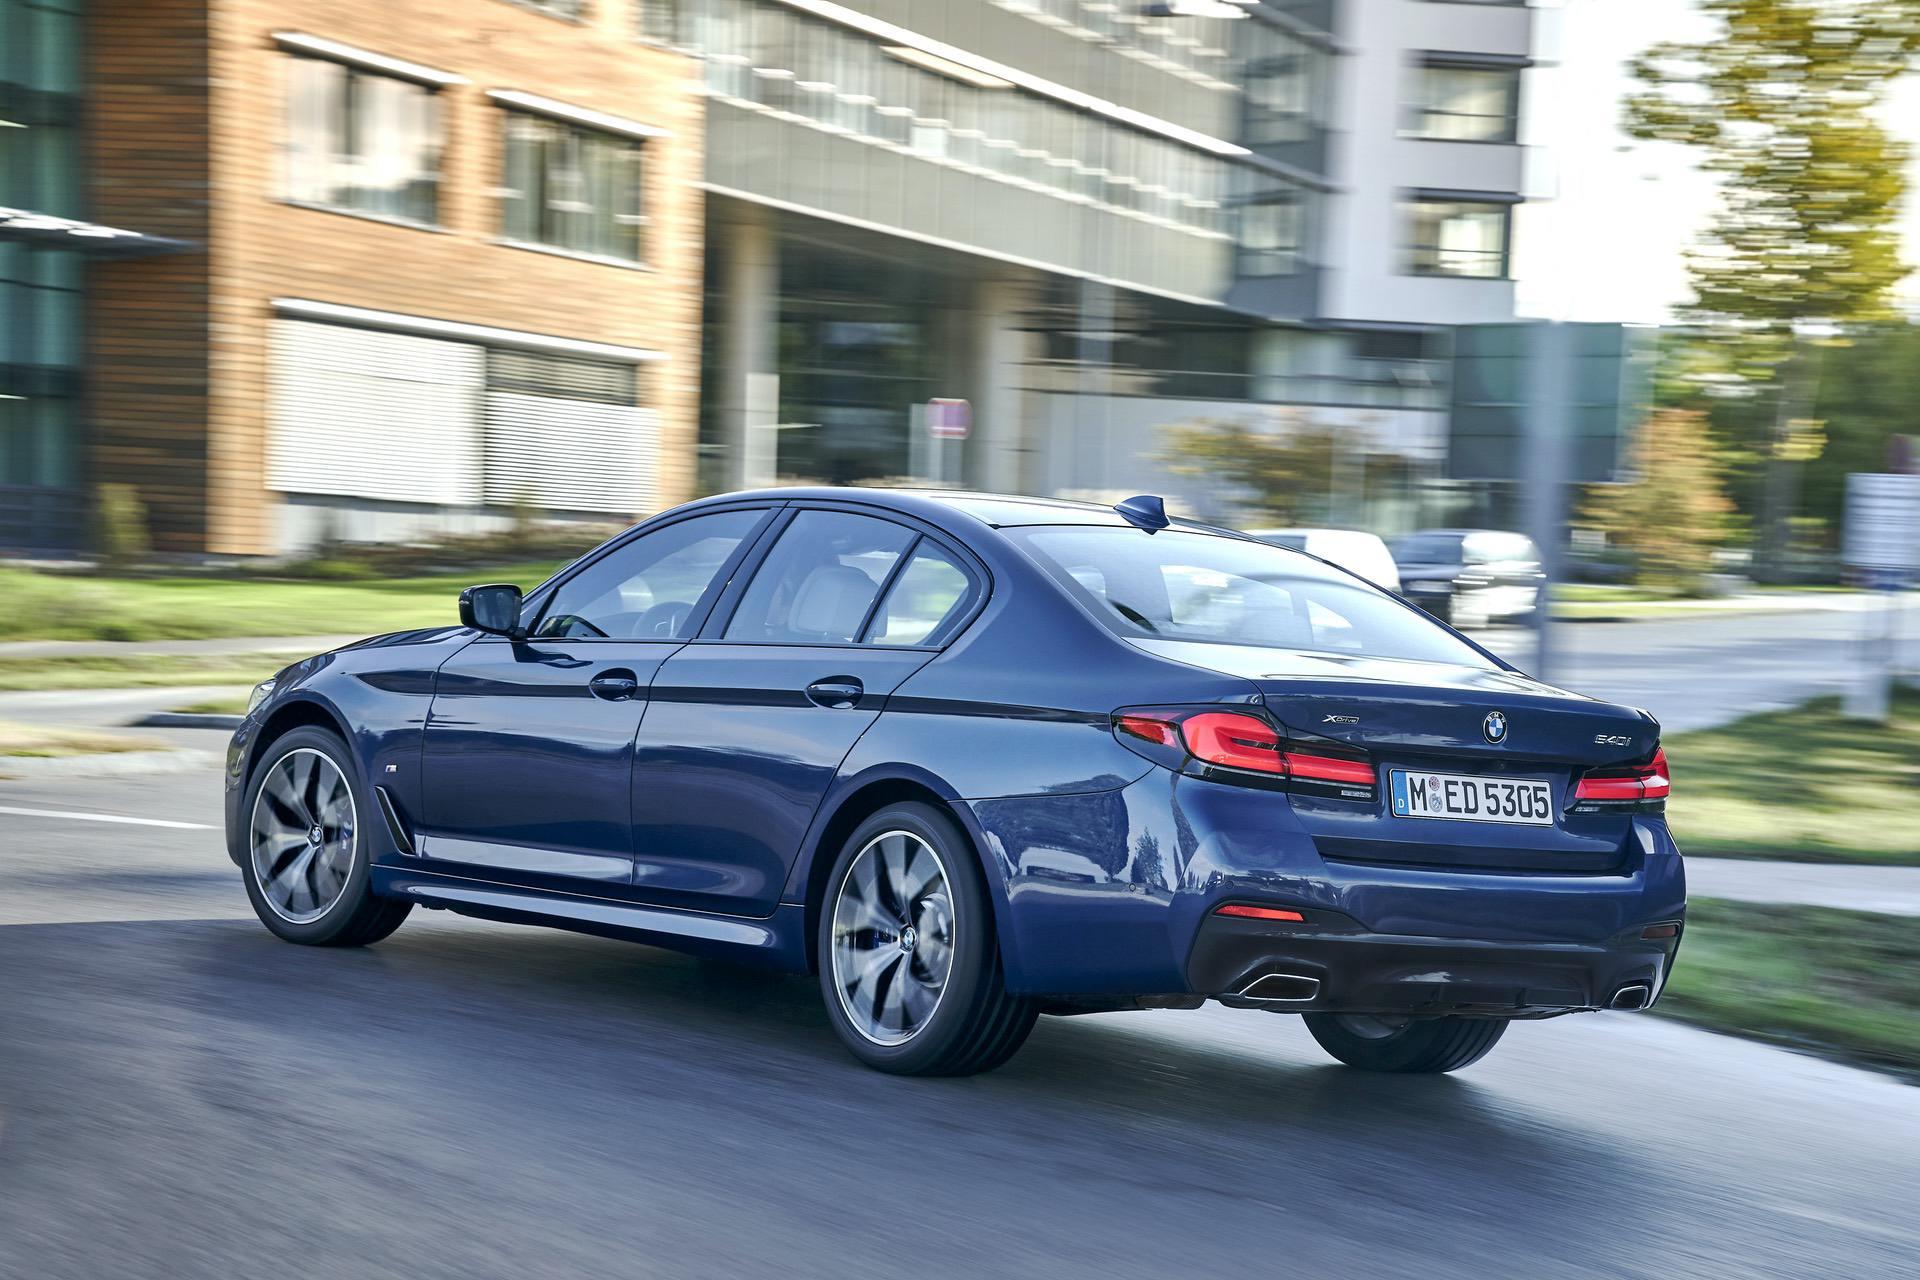 2021 BMW 540i xDrive Sedan Facelift - New Photo Gallery